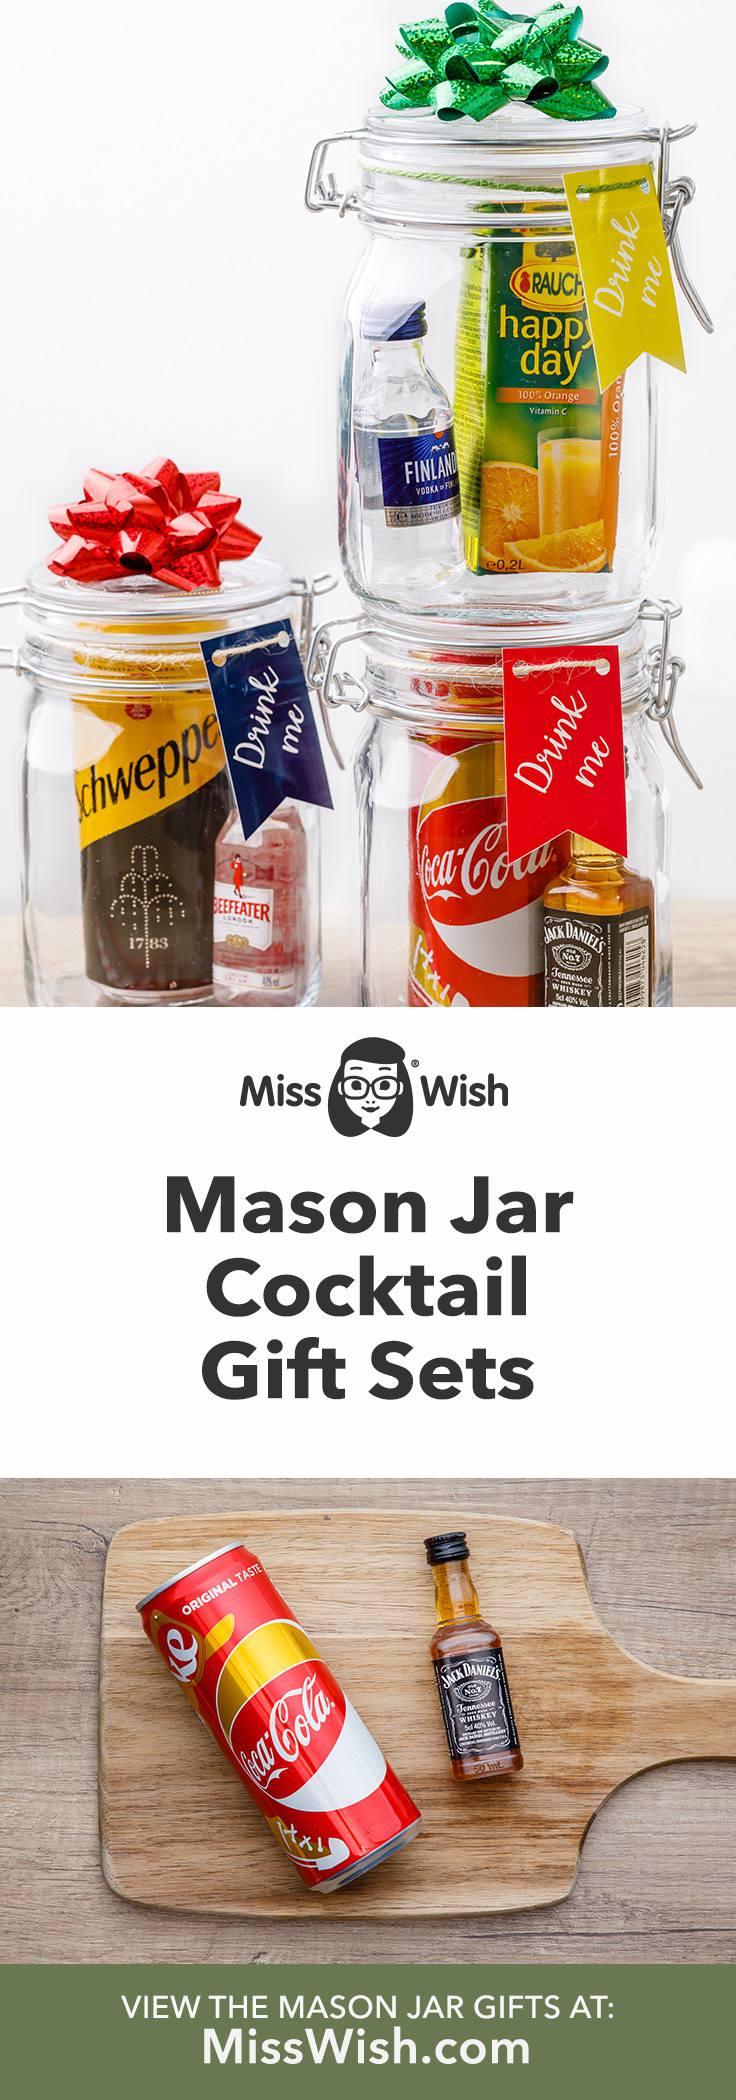 3 Easy Diy Mason Jar Cocktail Gift Sets in a Jar